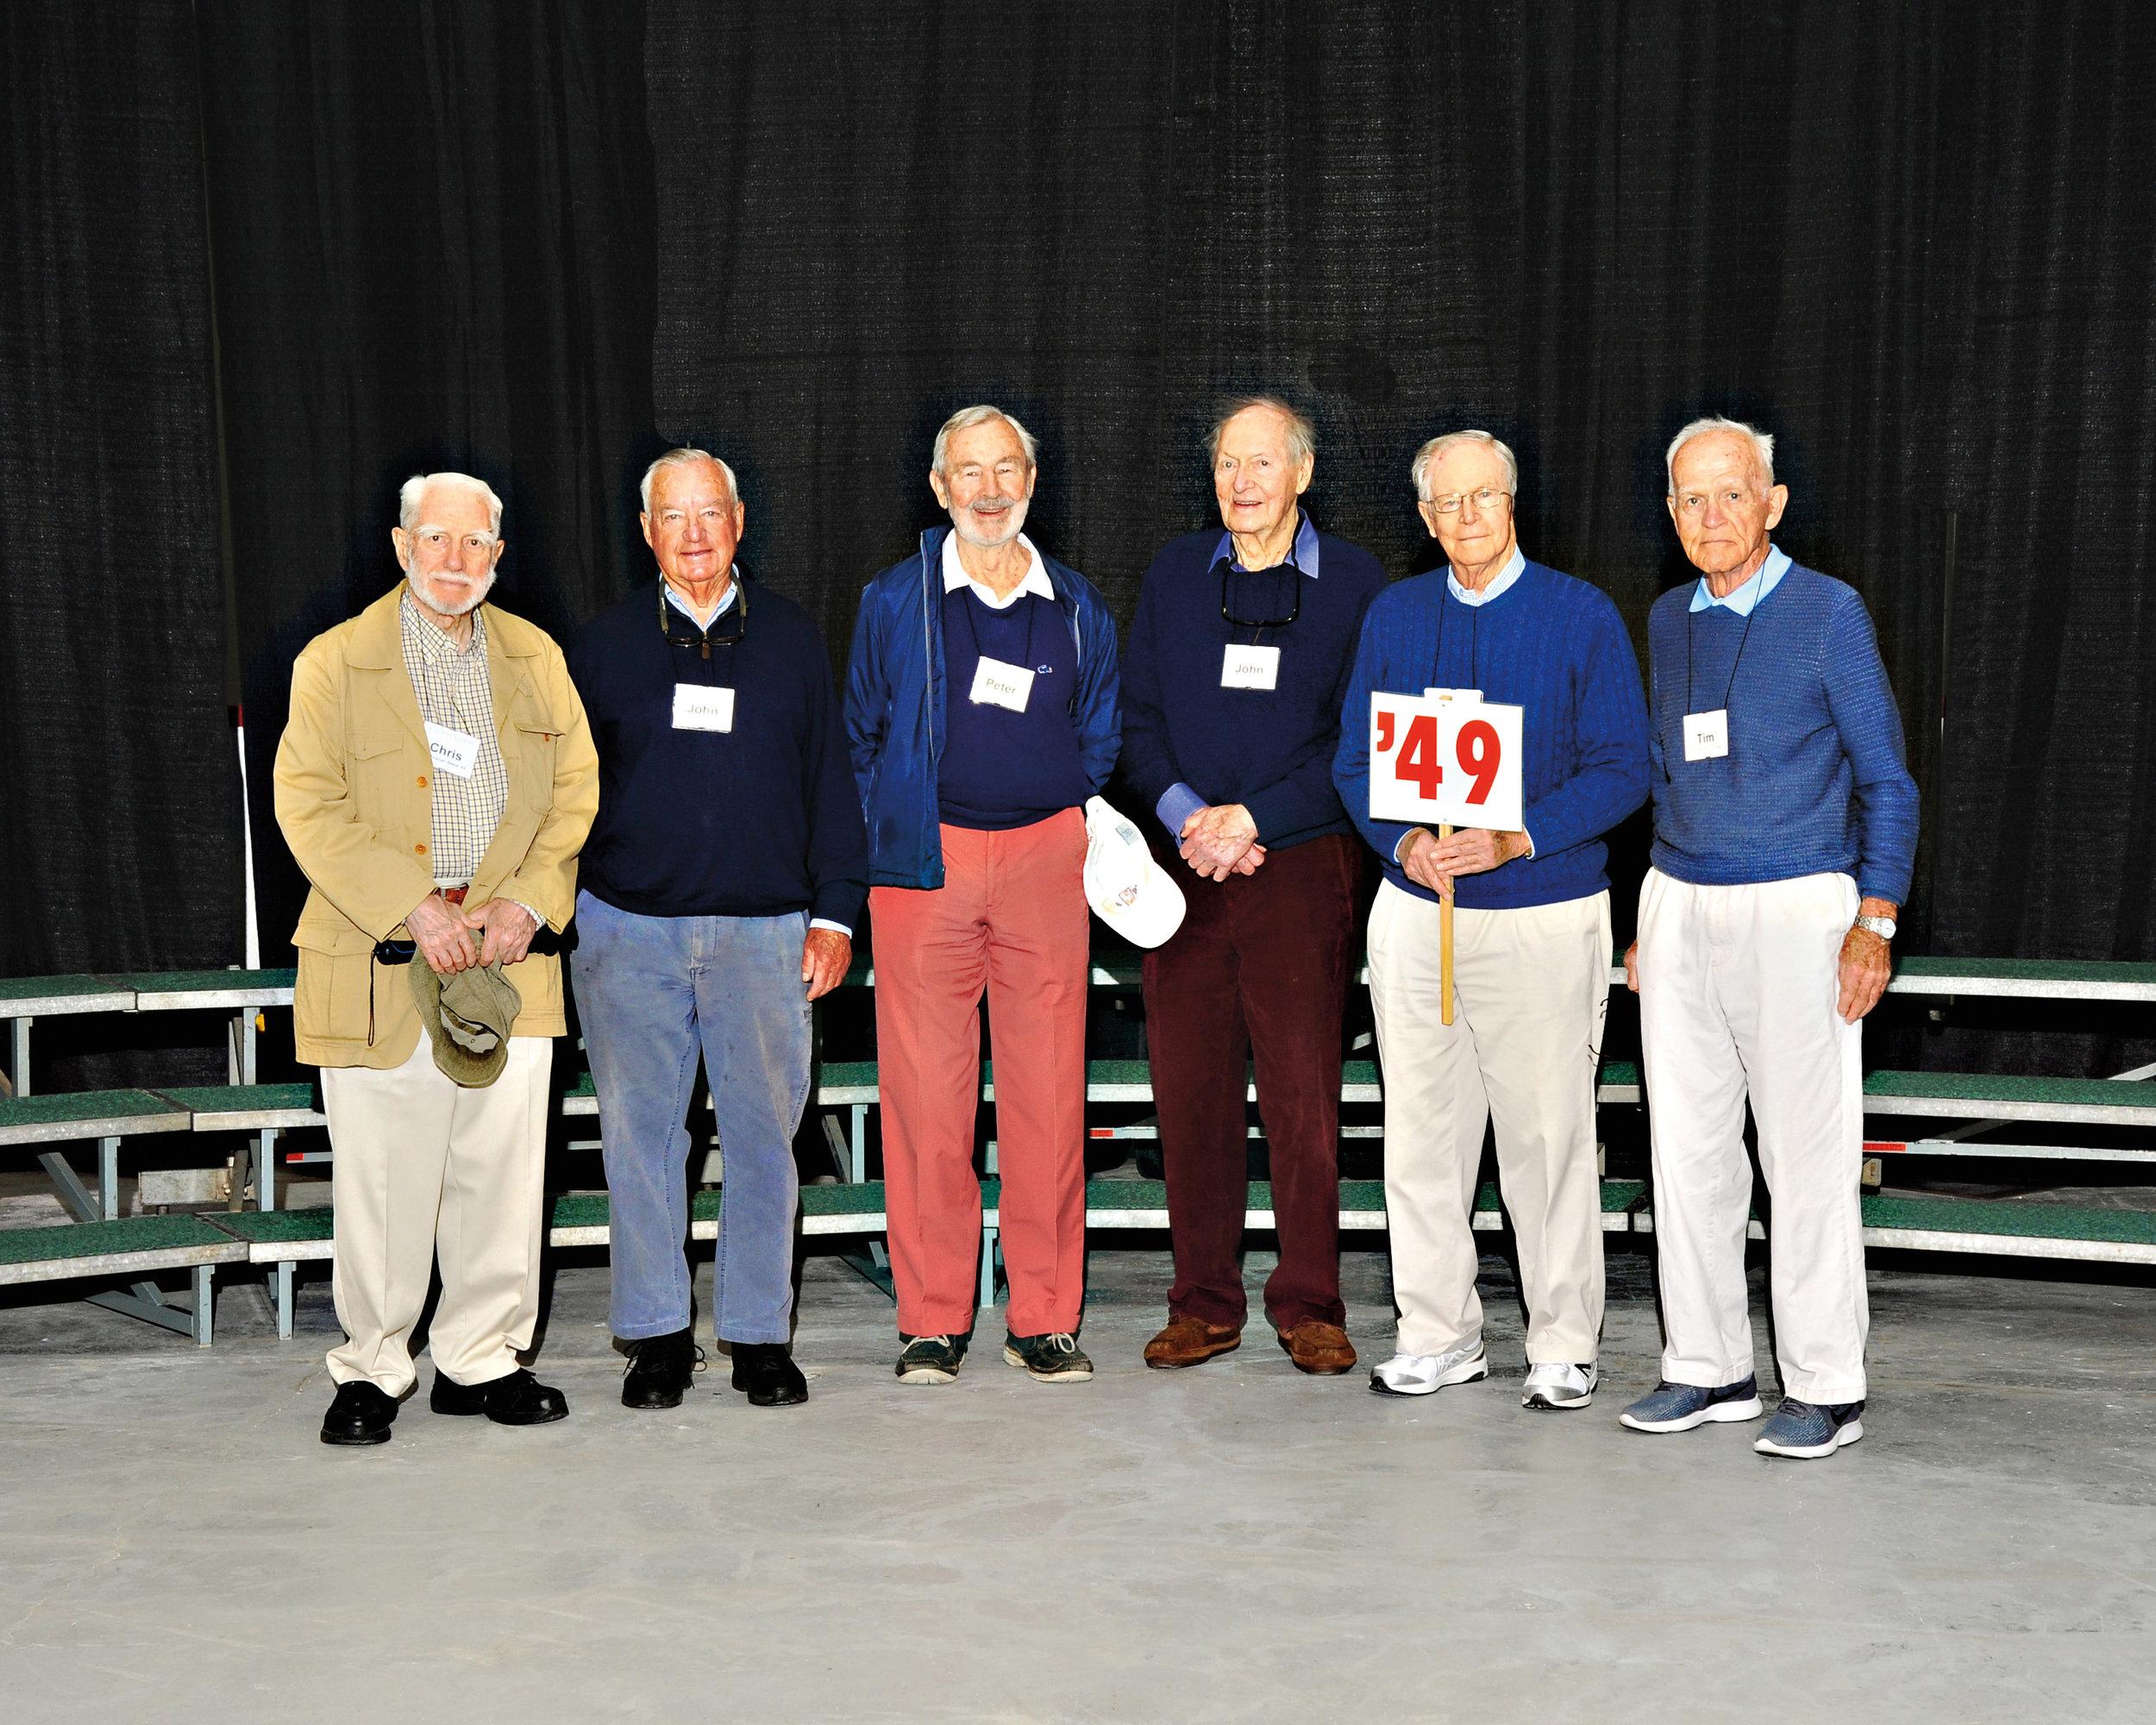 (L. to r.): Chris Beels, John Scully, Peter Van Doren, John Wagley, Sam Cooley, and Tim Colt.